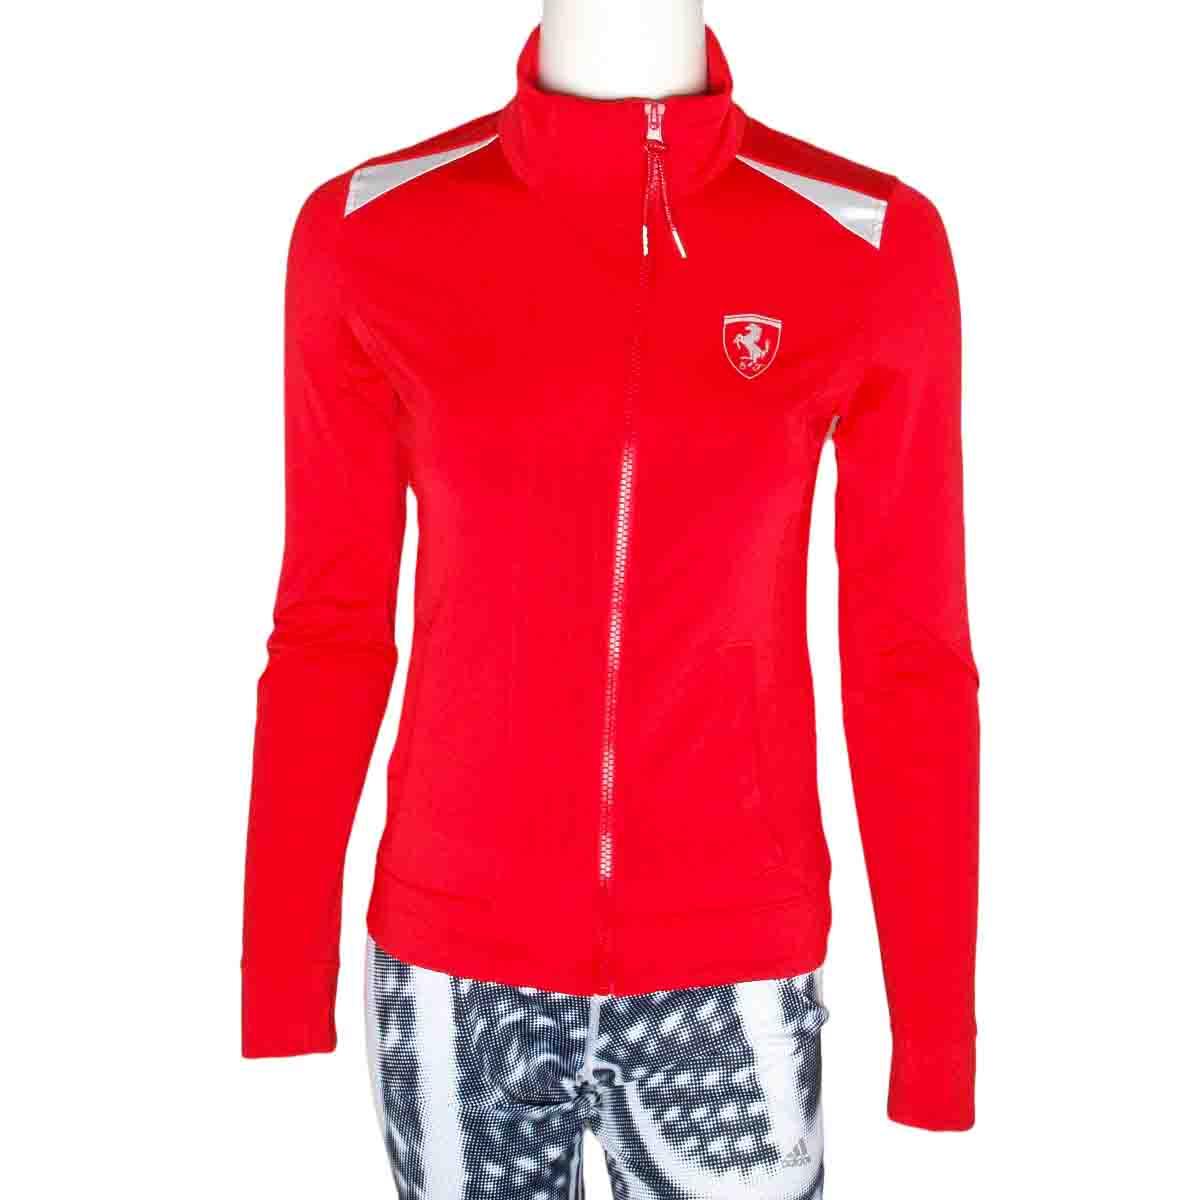 puma ferrari womens track jacket size uk 6 ebay. Black Bedroom Furniture Sets. Home Design Ideas